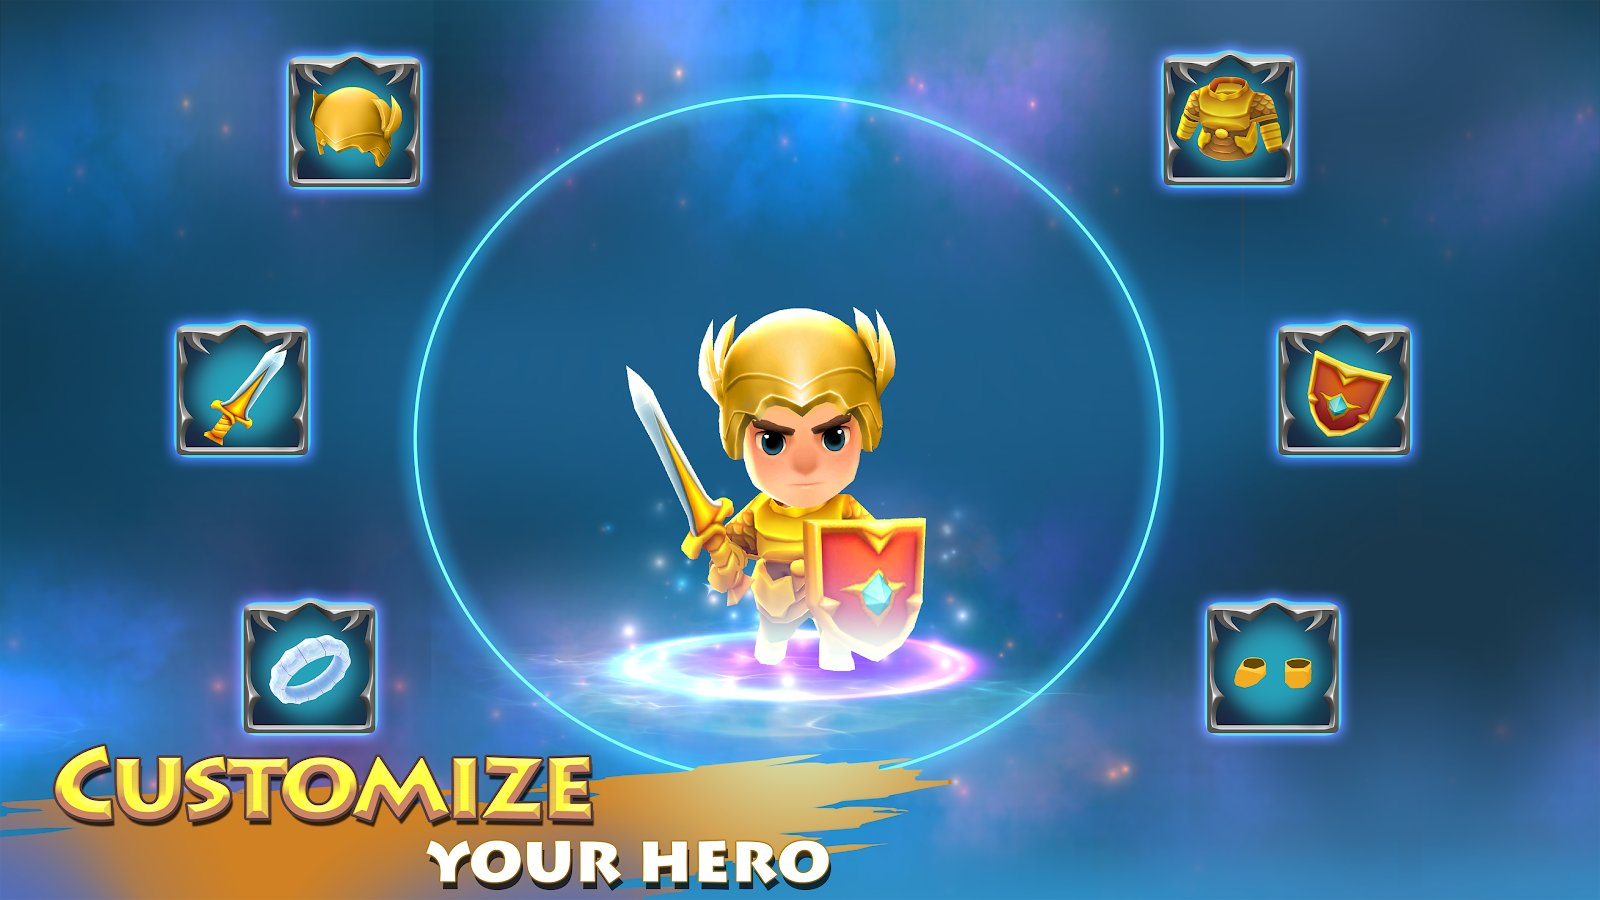 beast quest ultimate heroes скачать 1027 apk на android